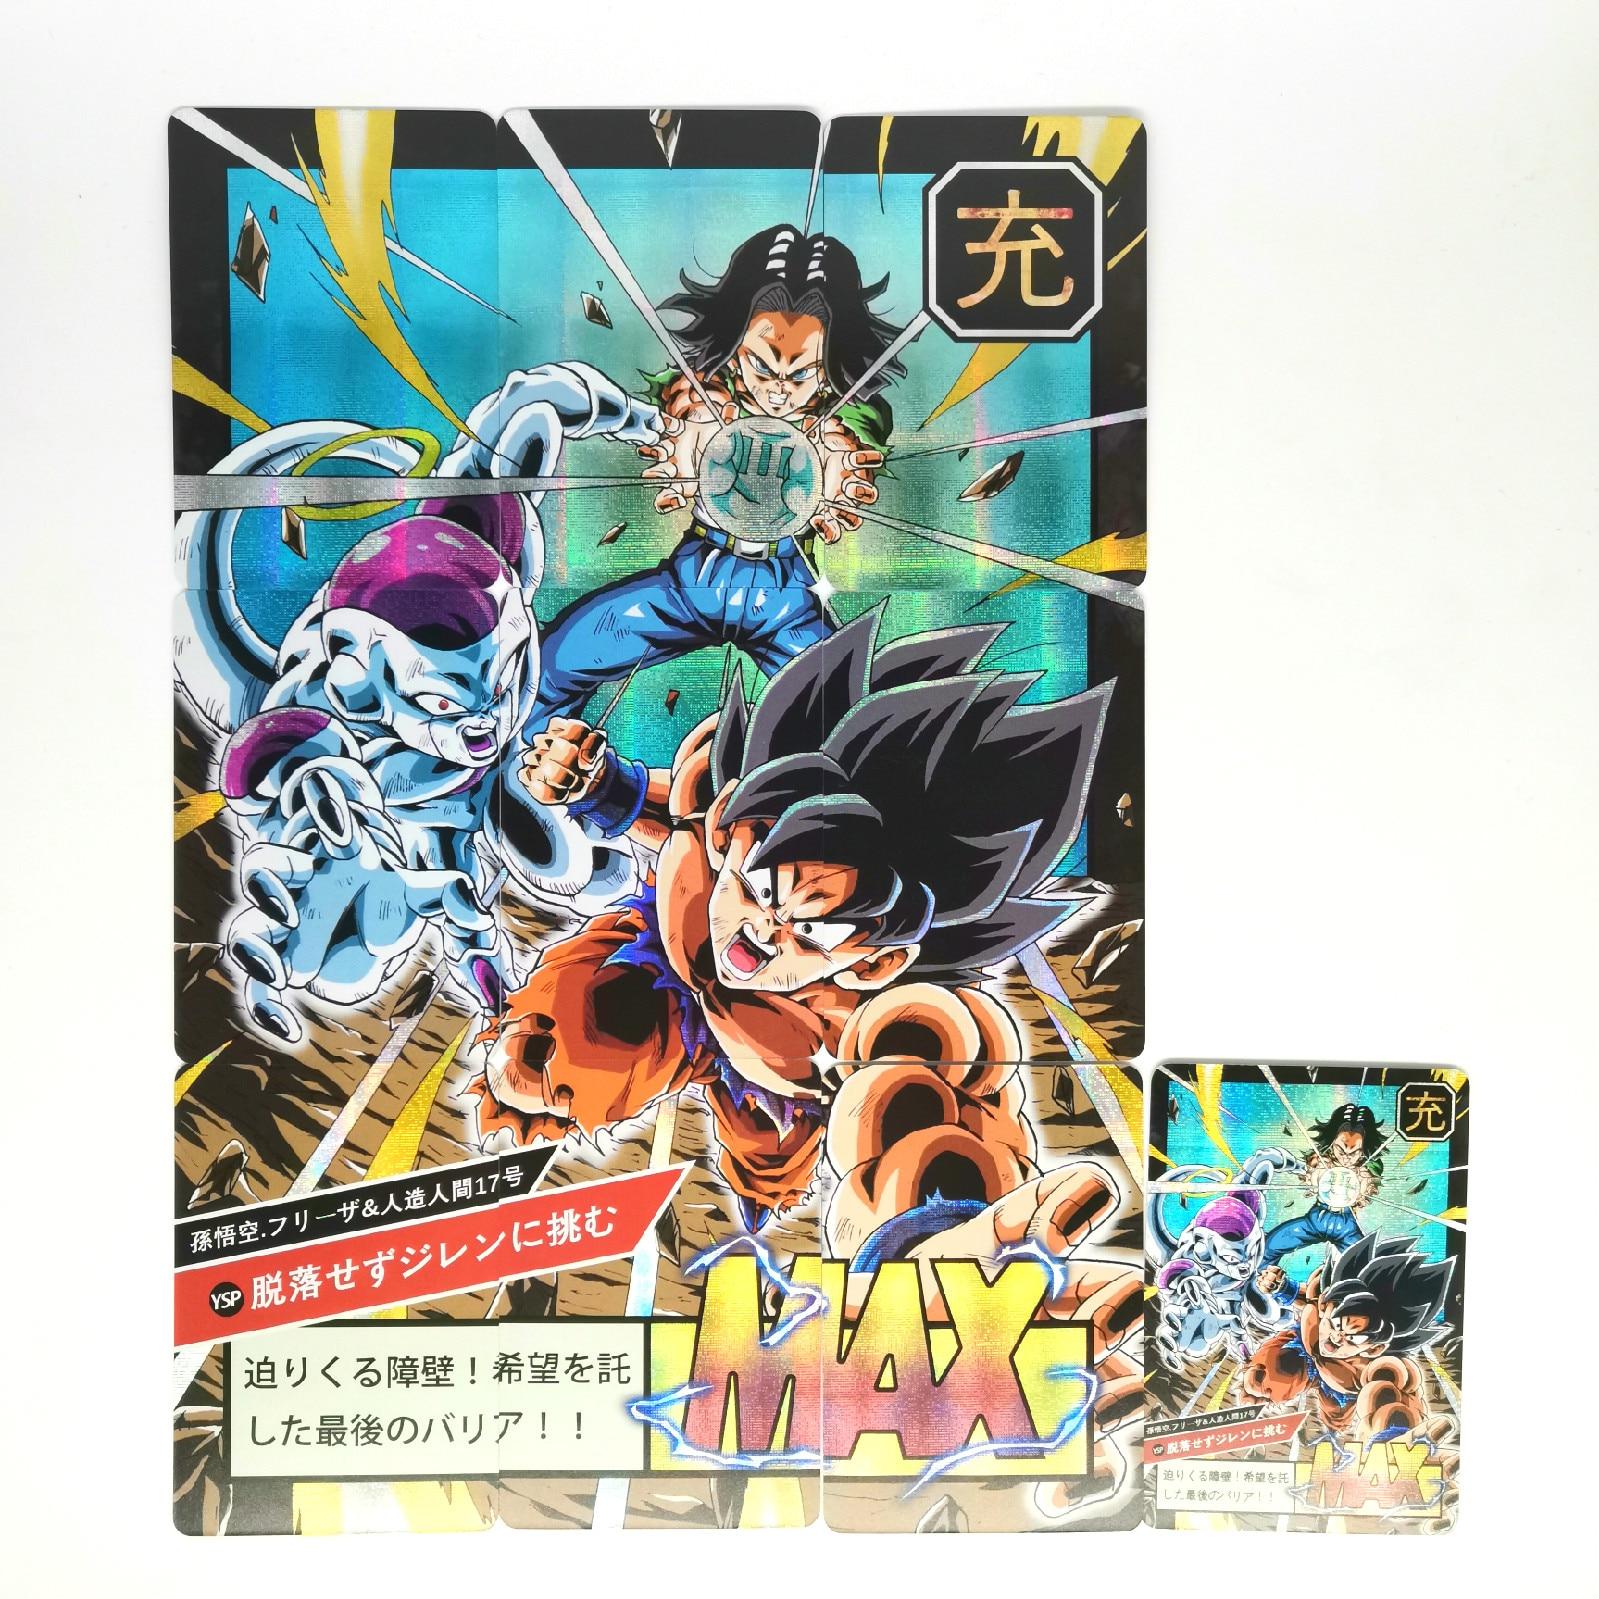 10pcs Super Dragon Ball Z Heroes Battle Card Ultra Instinct Goku Vegeta Game Collection Cards